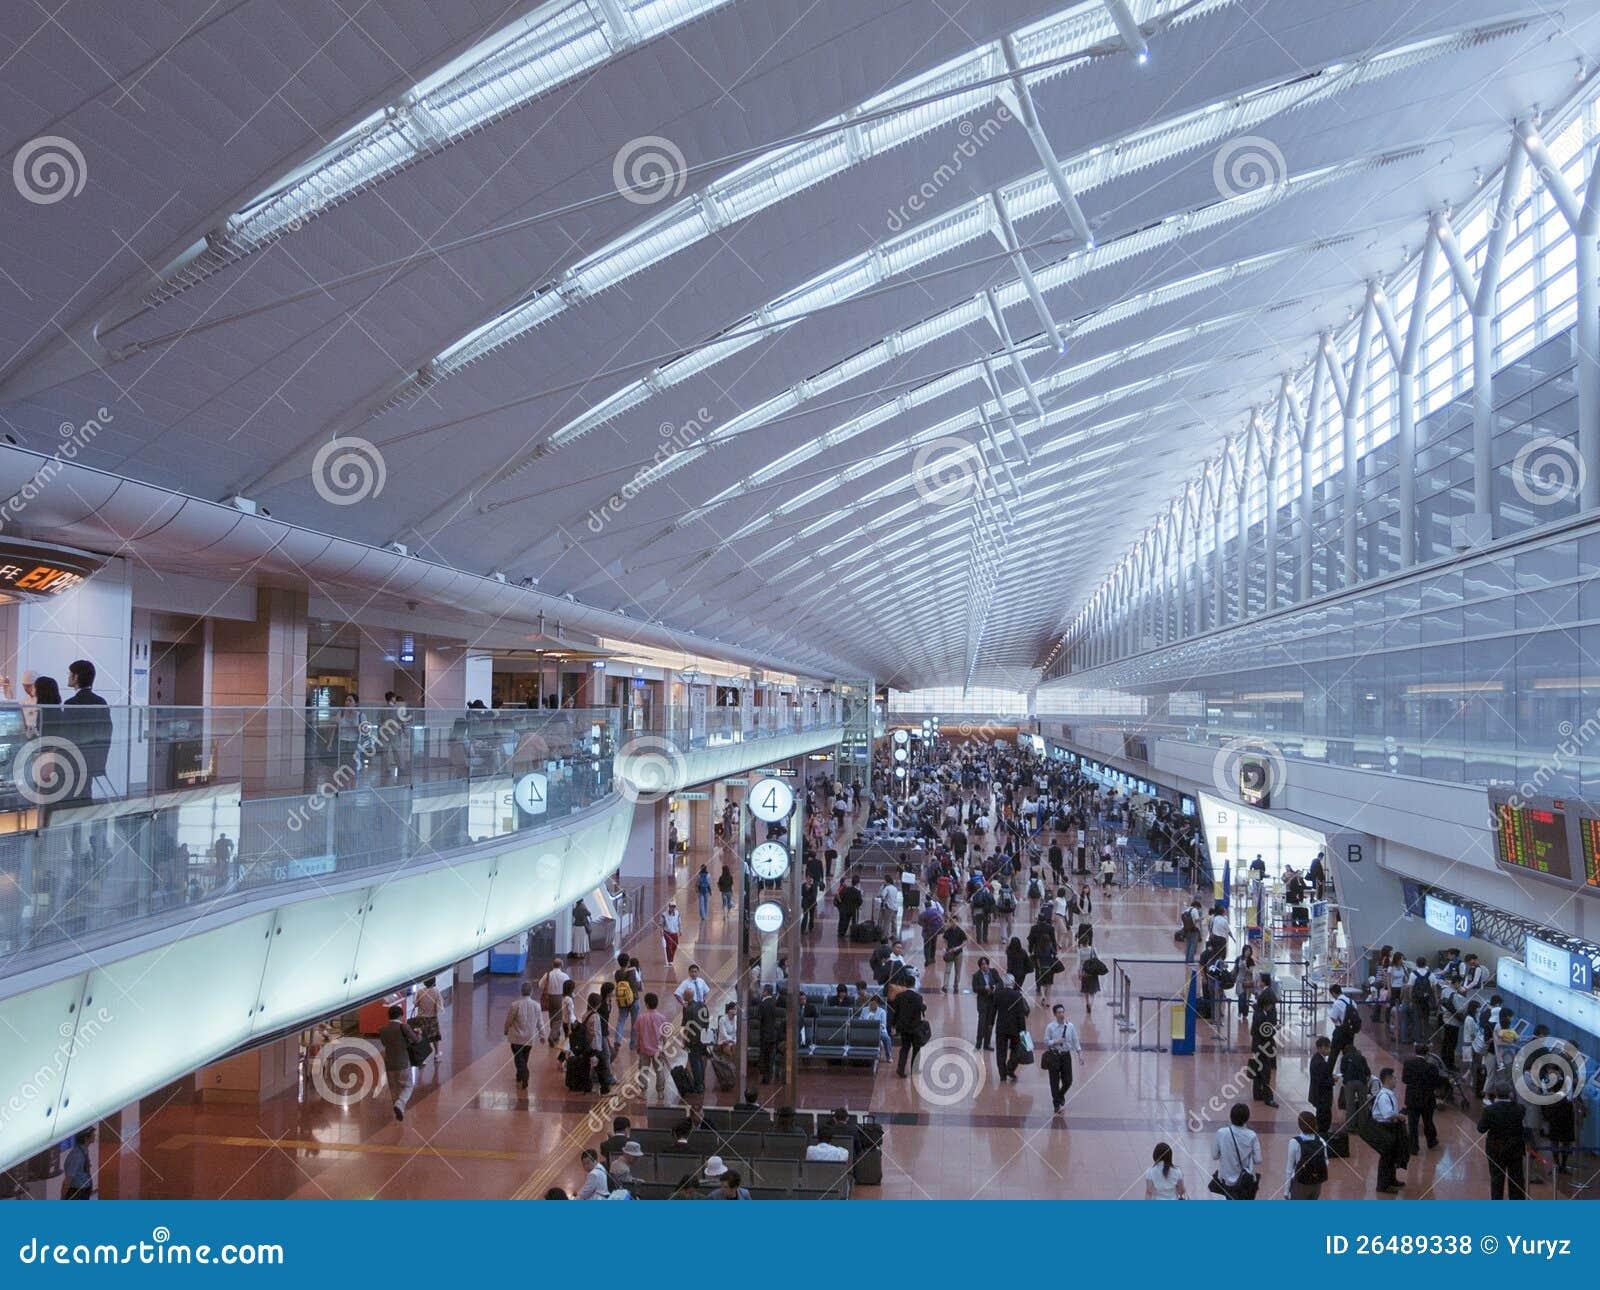 Aeroporto Tokyo : Aeroporto de haneda tokyo foto de stock editorial imagem de